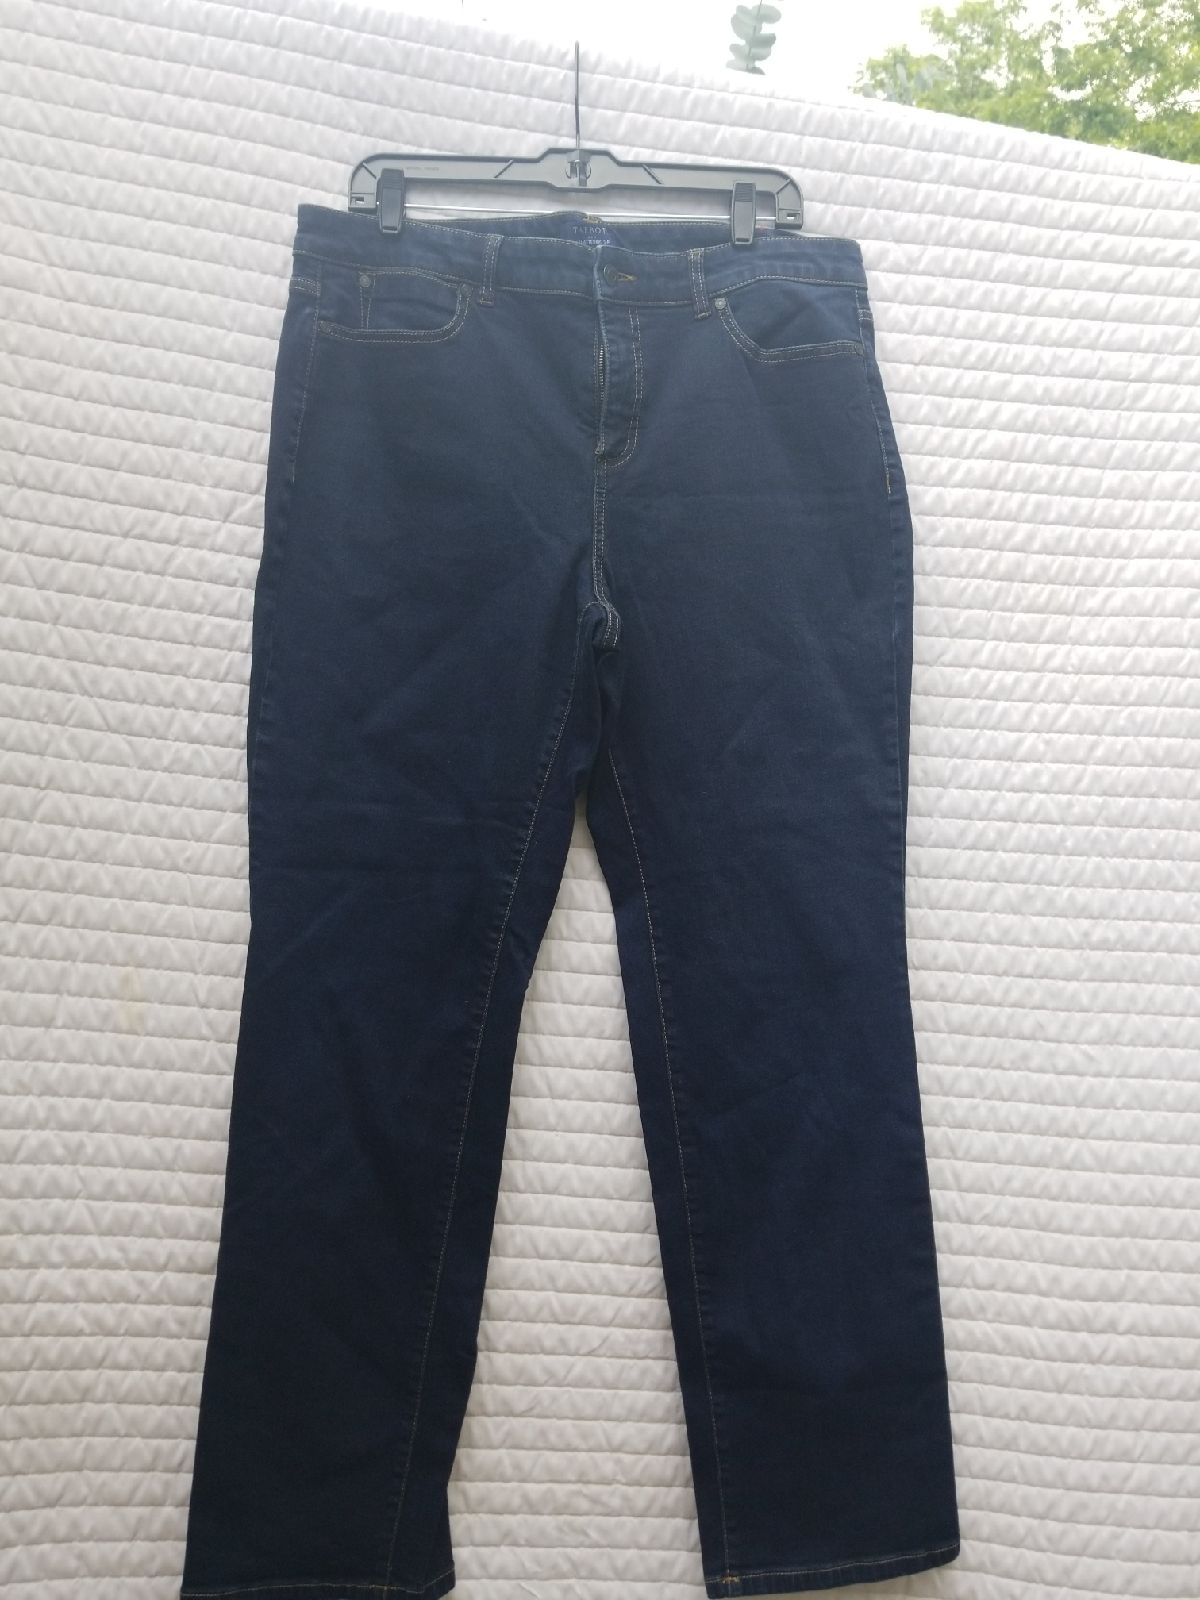 Talbot Jeans 14W